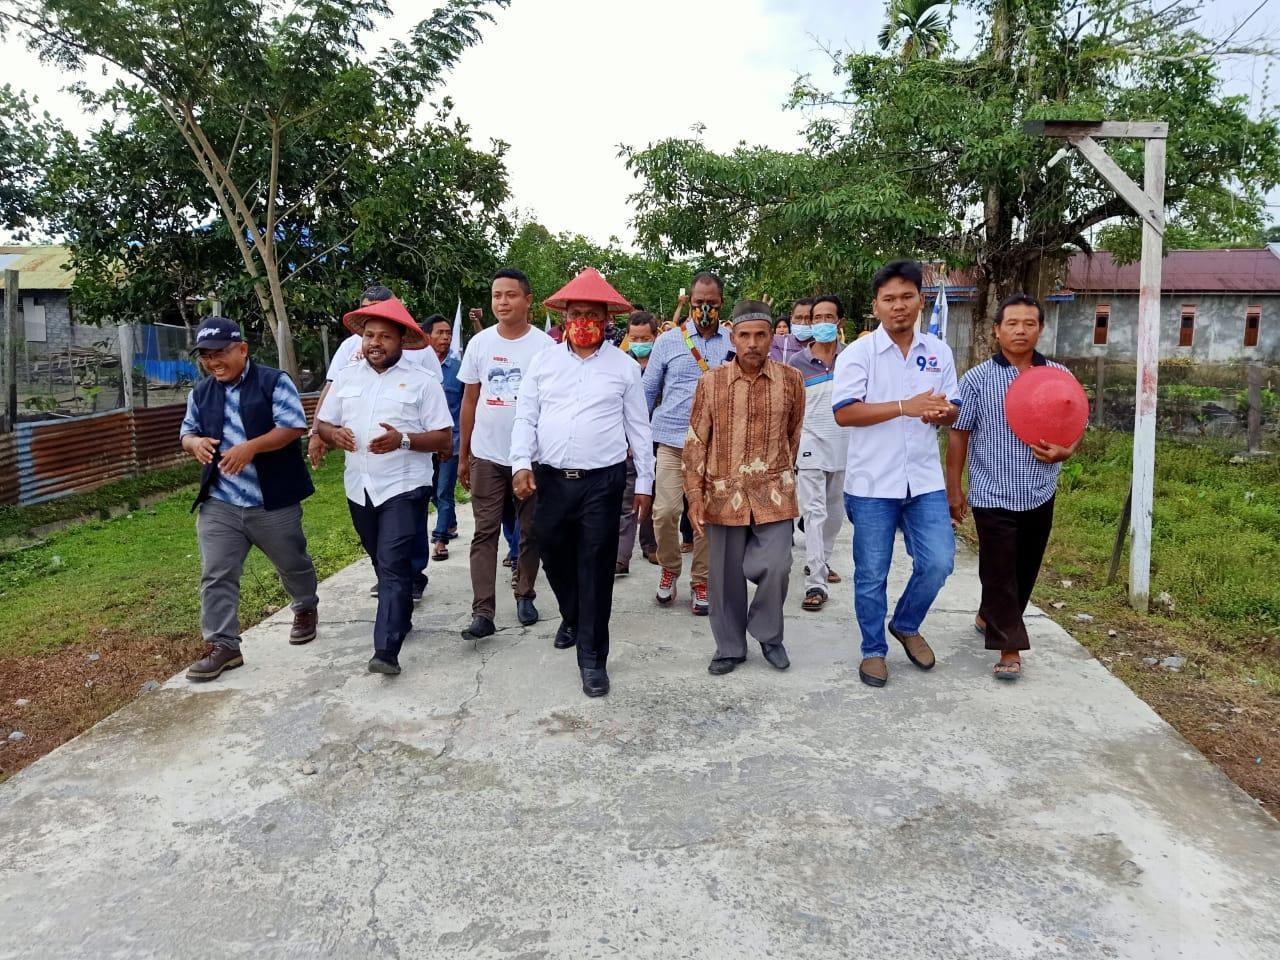 Keluh Jalan Rusak Sejak Tahun 1986, Warga Kampung Wariori Percaya Hermus-Edi Pimpin Manowari Pasti Peduli 17 IMG 20201127 WA0023